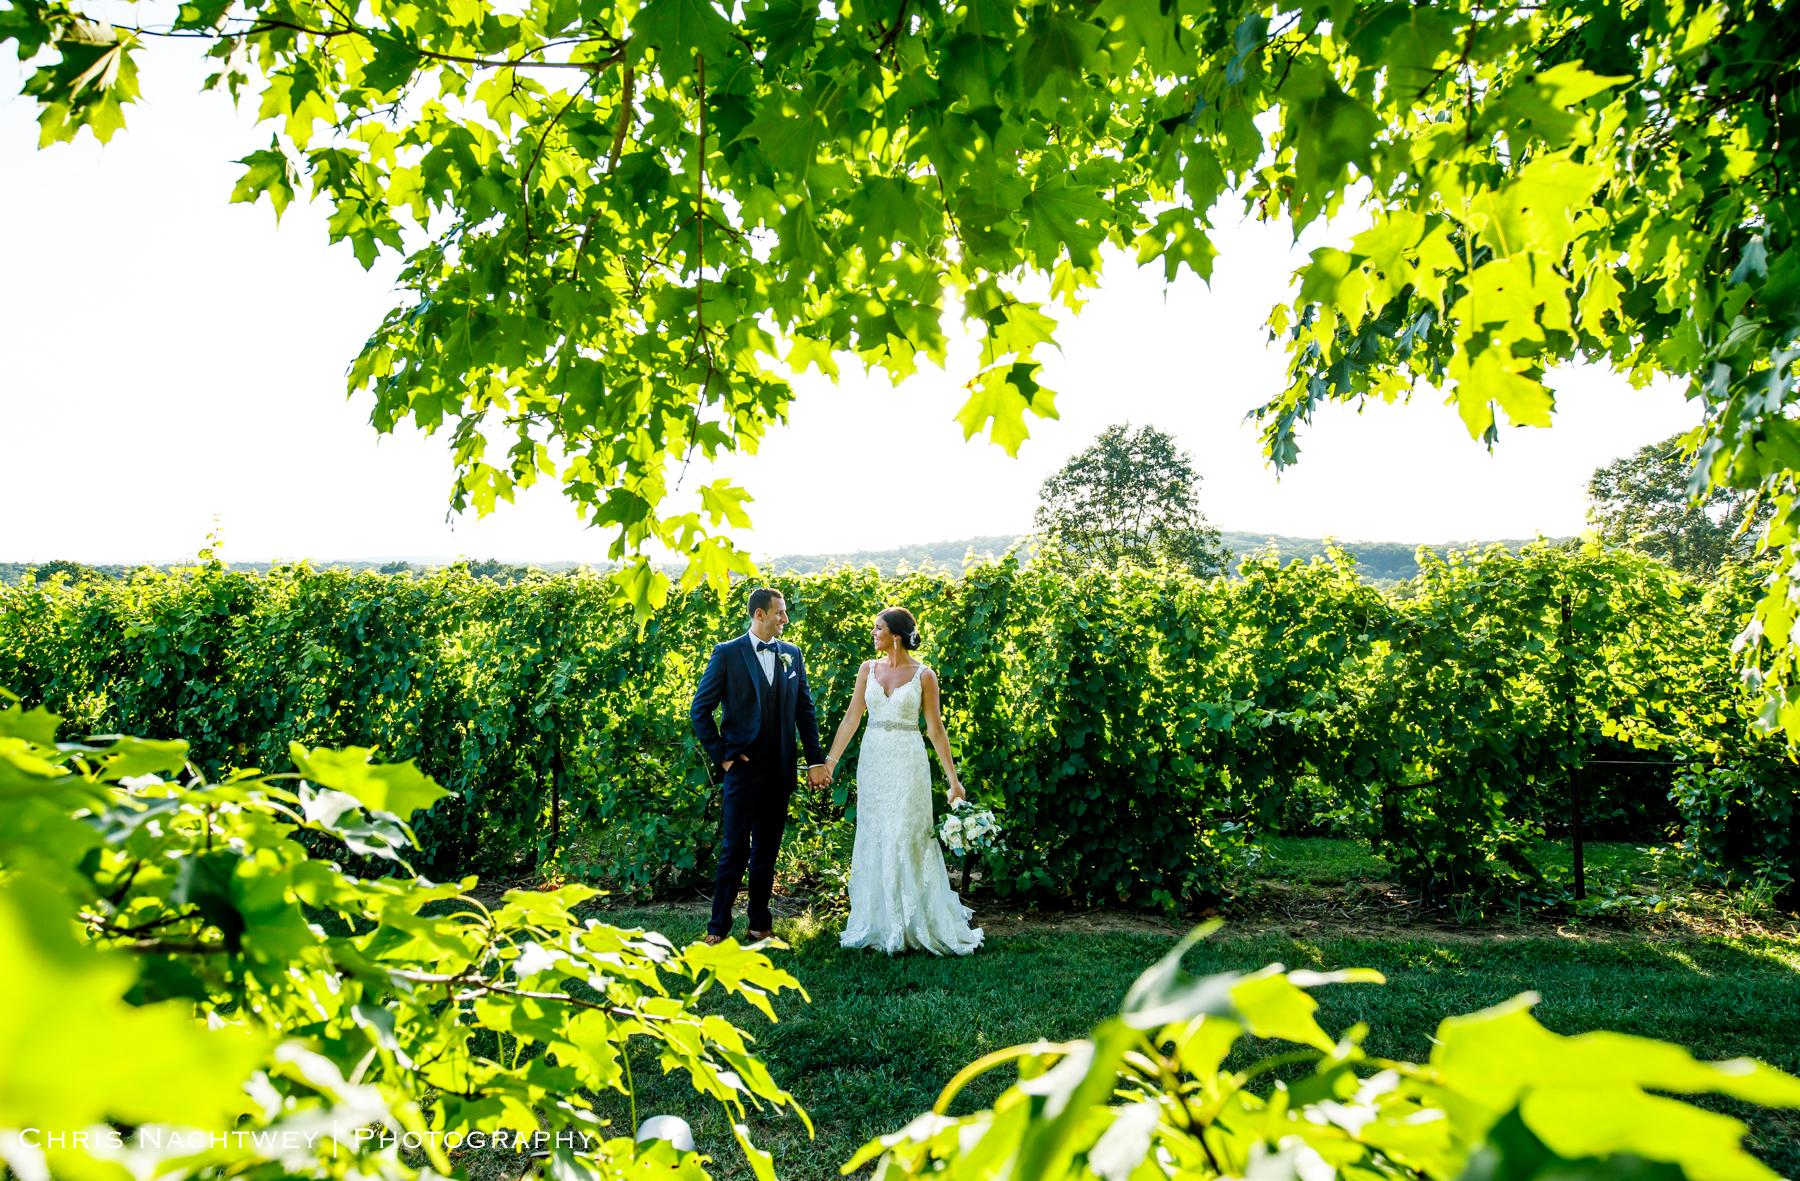 wedding-lake-of-isles-photos-chris-nachtwey-photography-2019-37.jpg